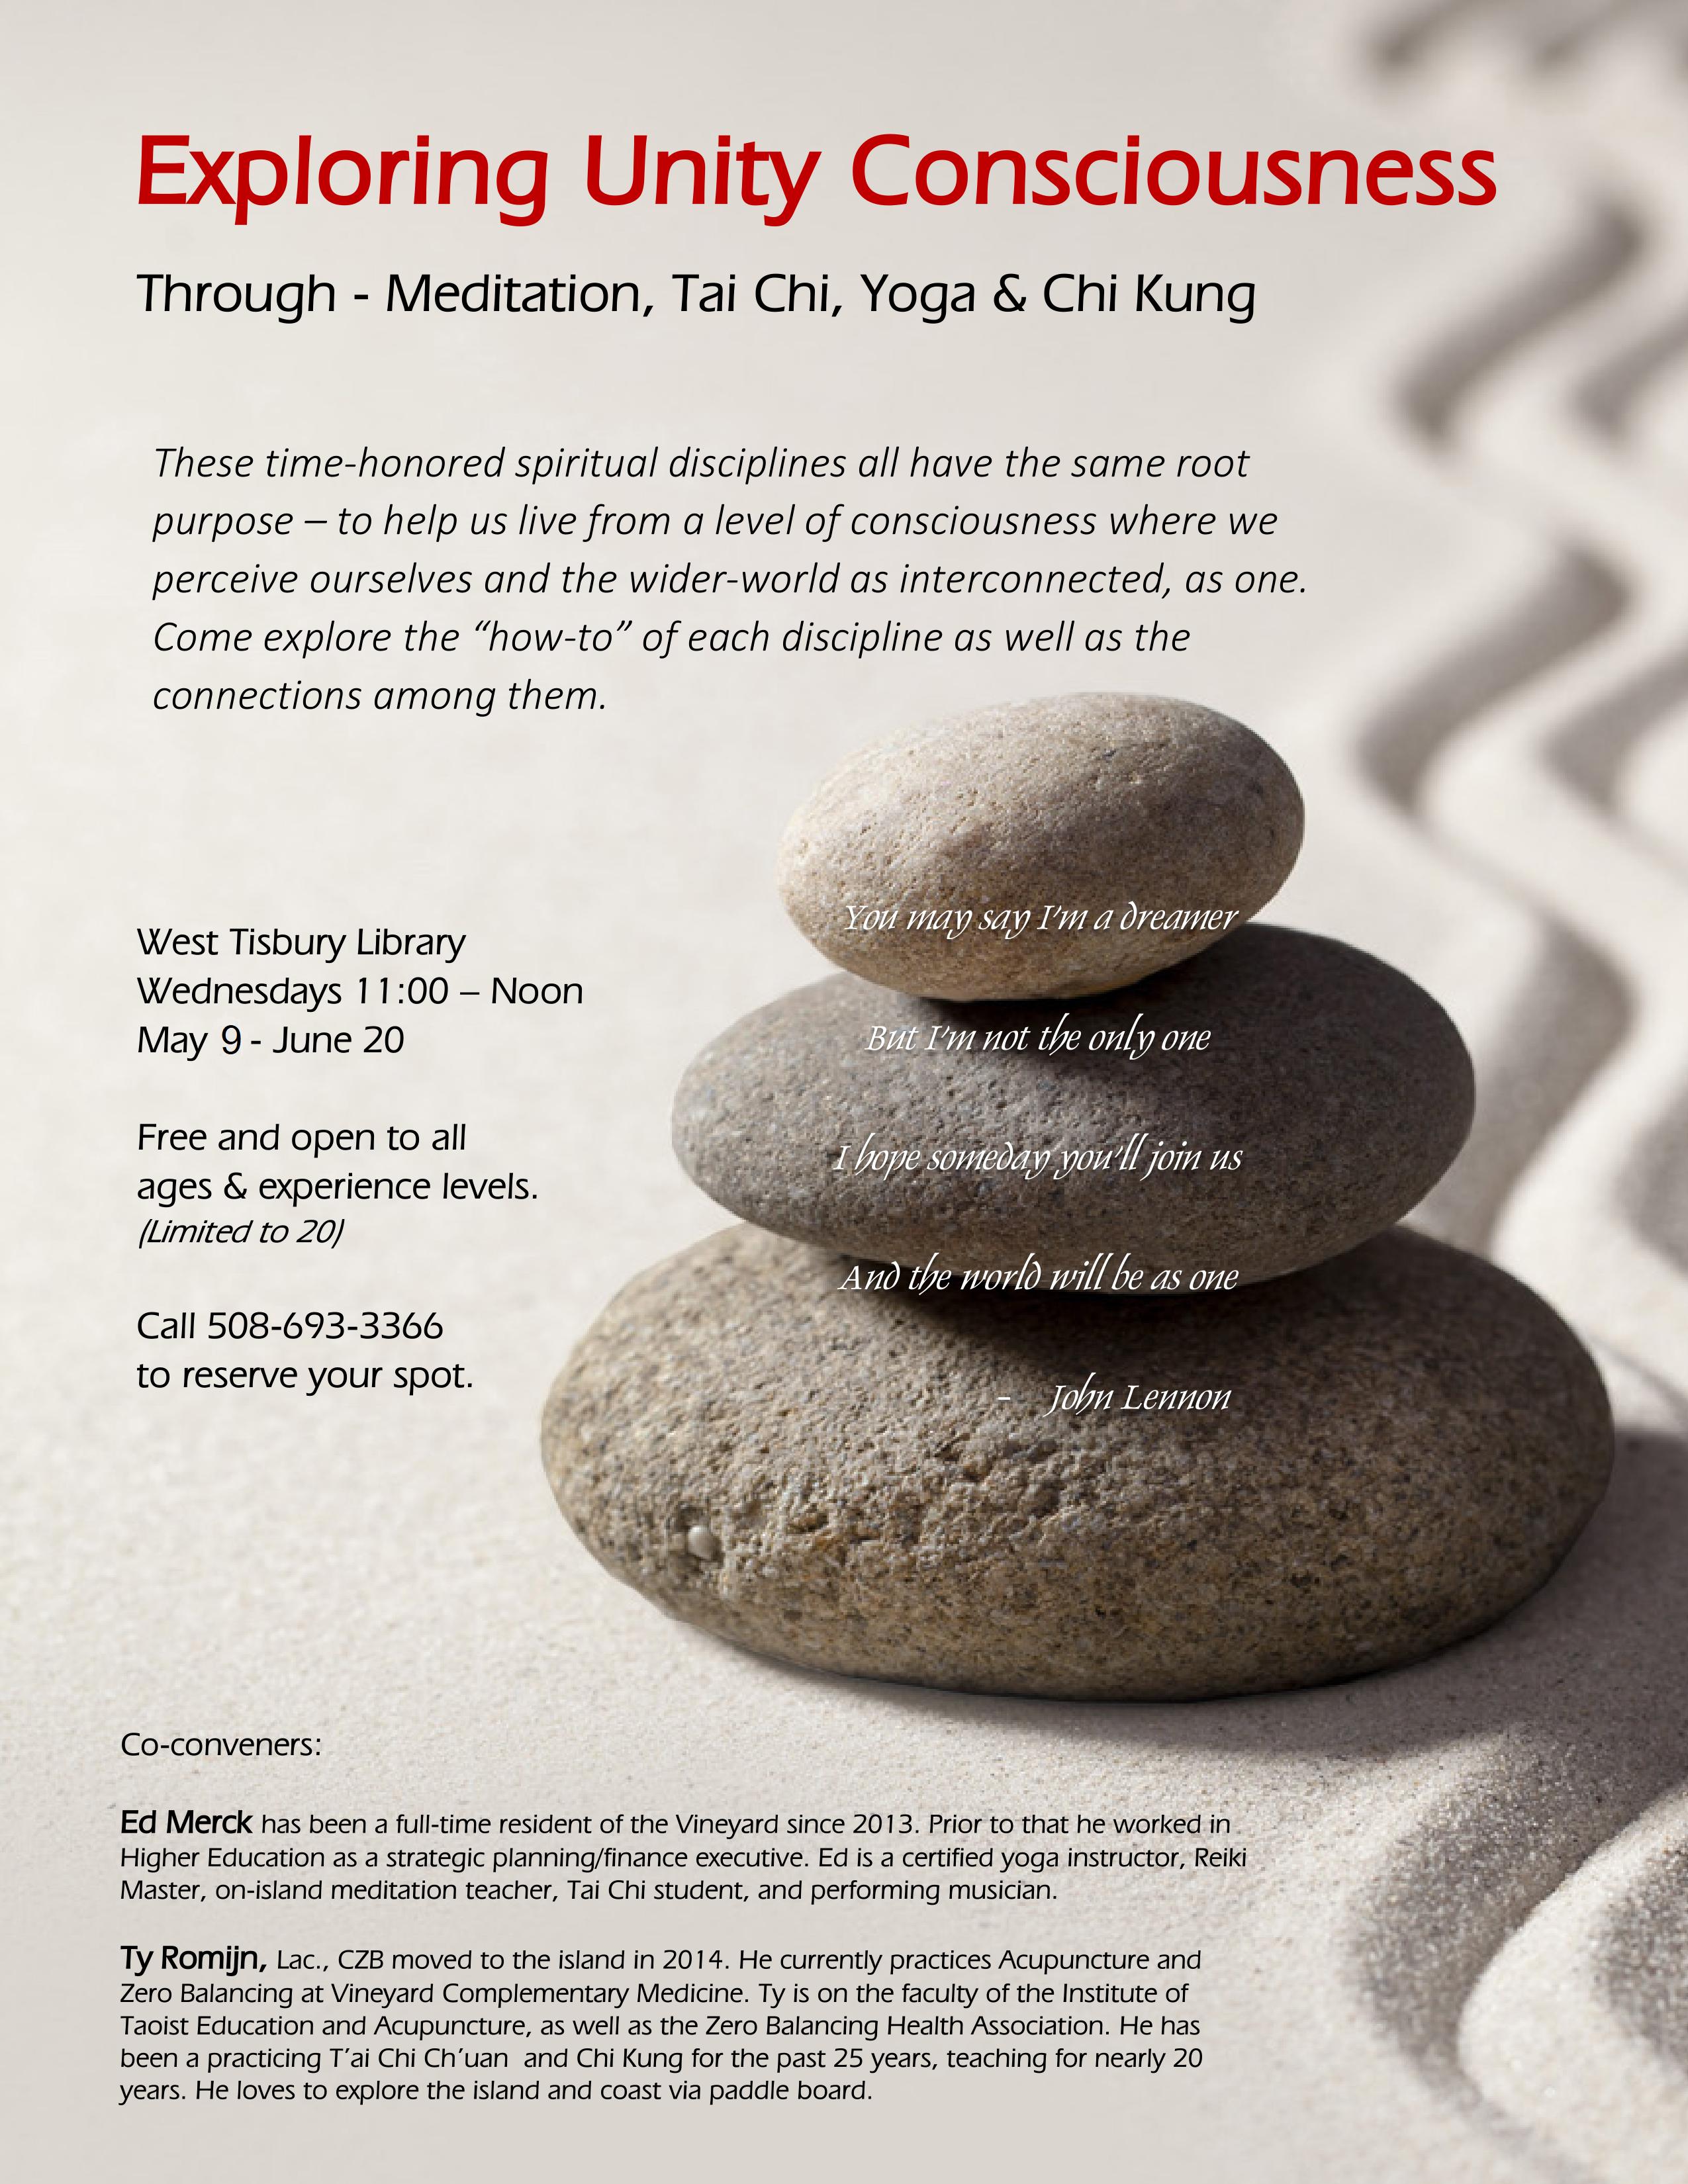 CLASS FULL! Exploring Unity Consciousness: Meditation, Tai Chi, Yoga, Chi Kung